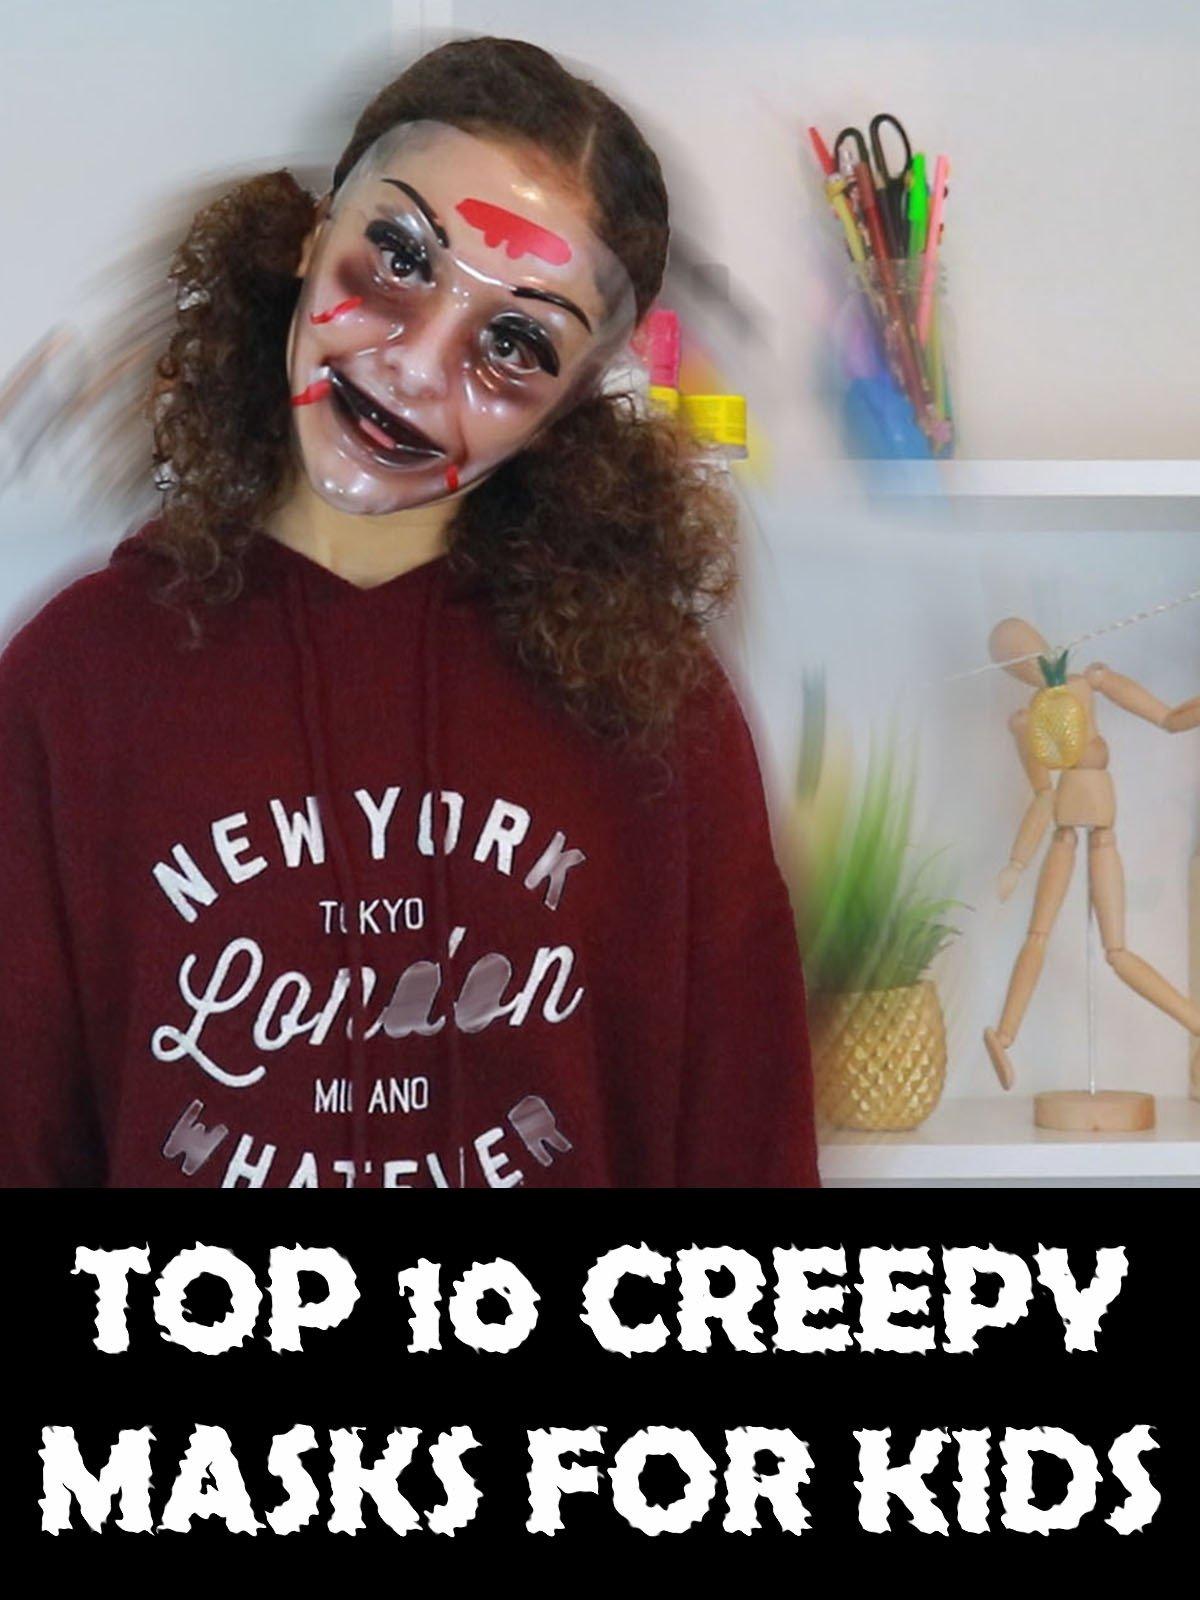 Top 10 Creepy Masks For Kids